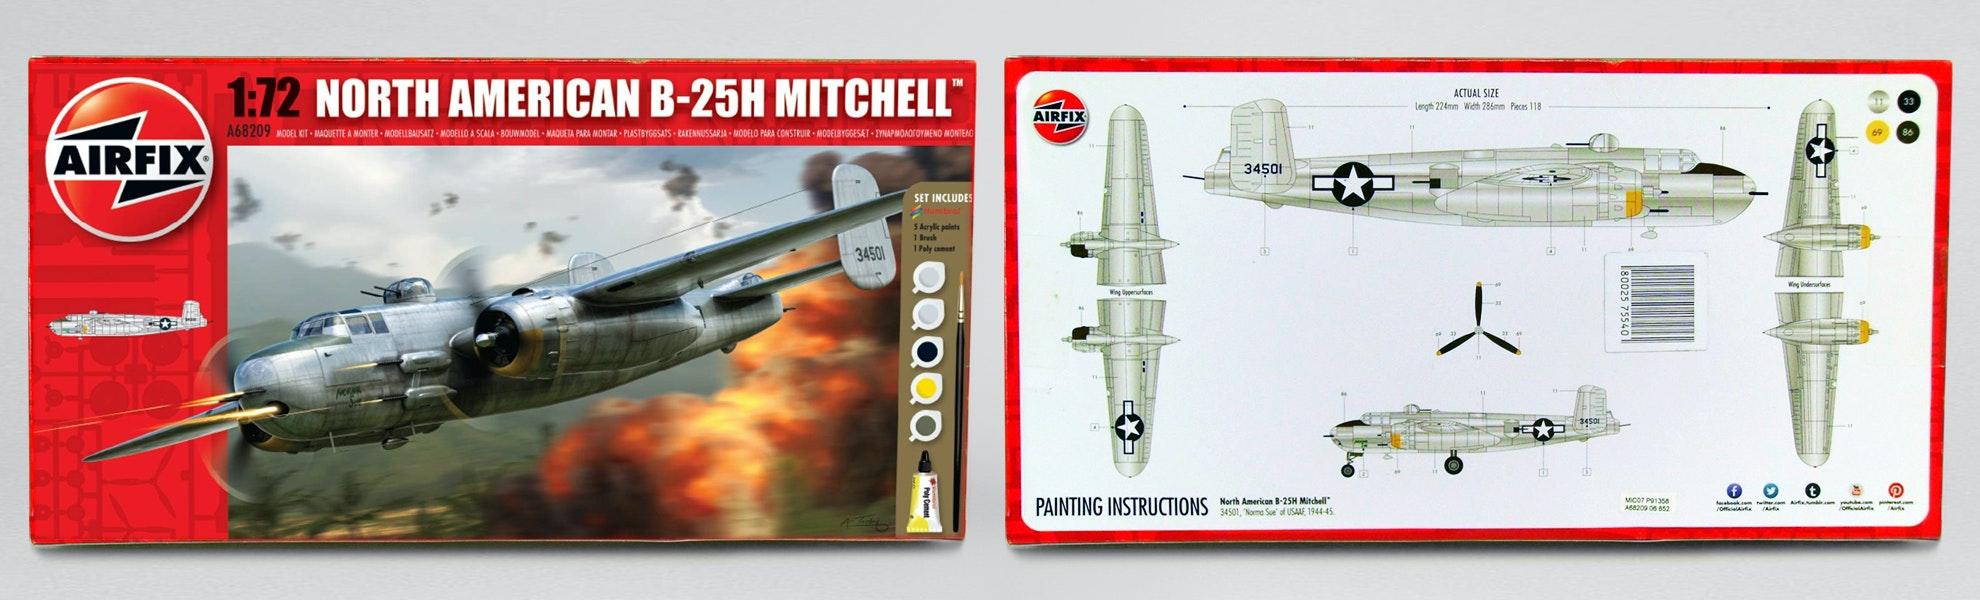 Airfix North American B-25 Mitchell Model 1:72